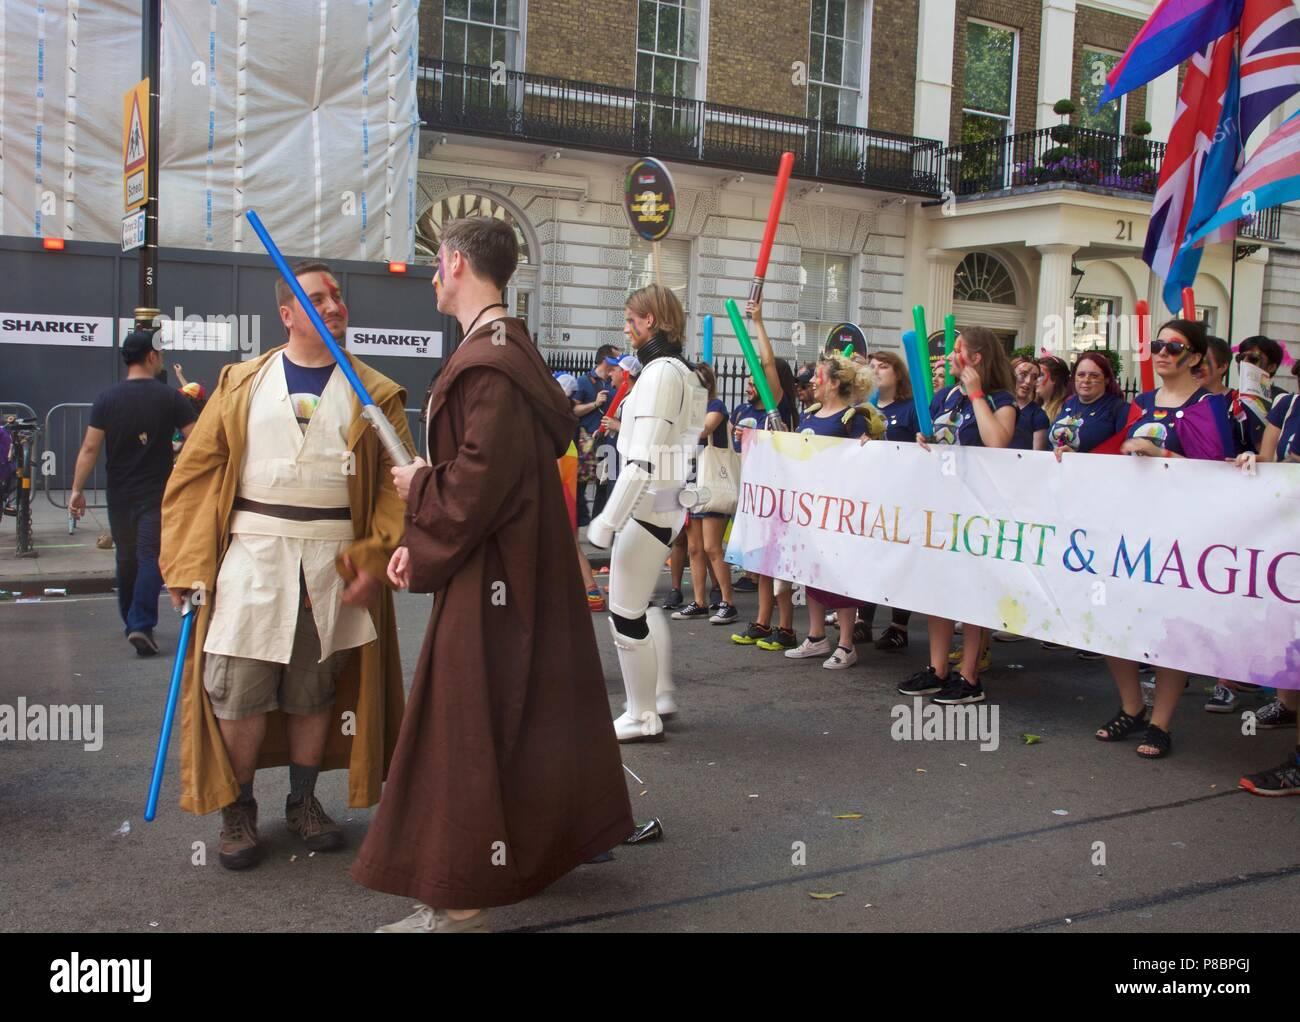 from Valentin london ontario gay pride 2010